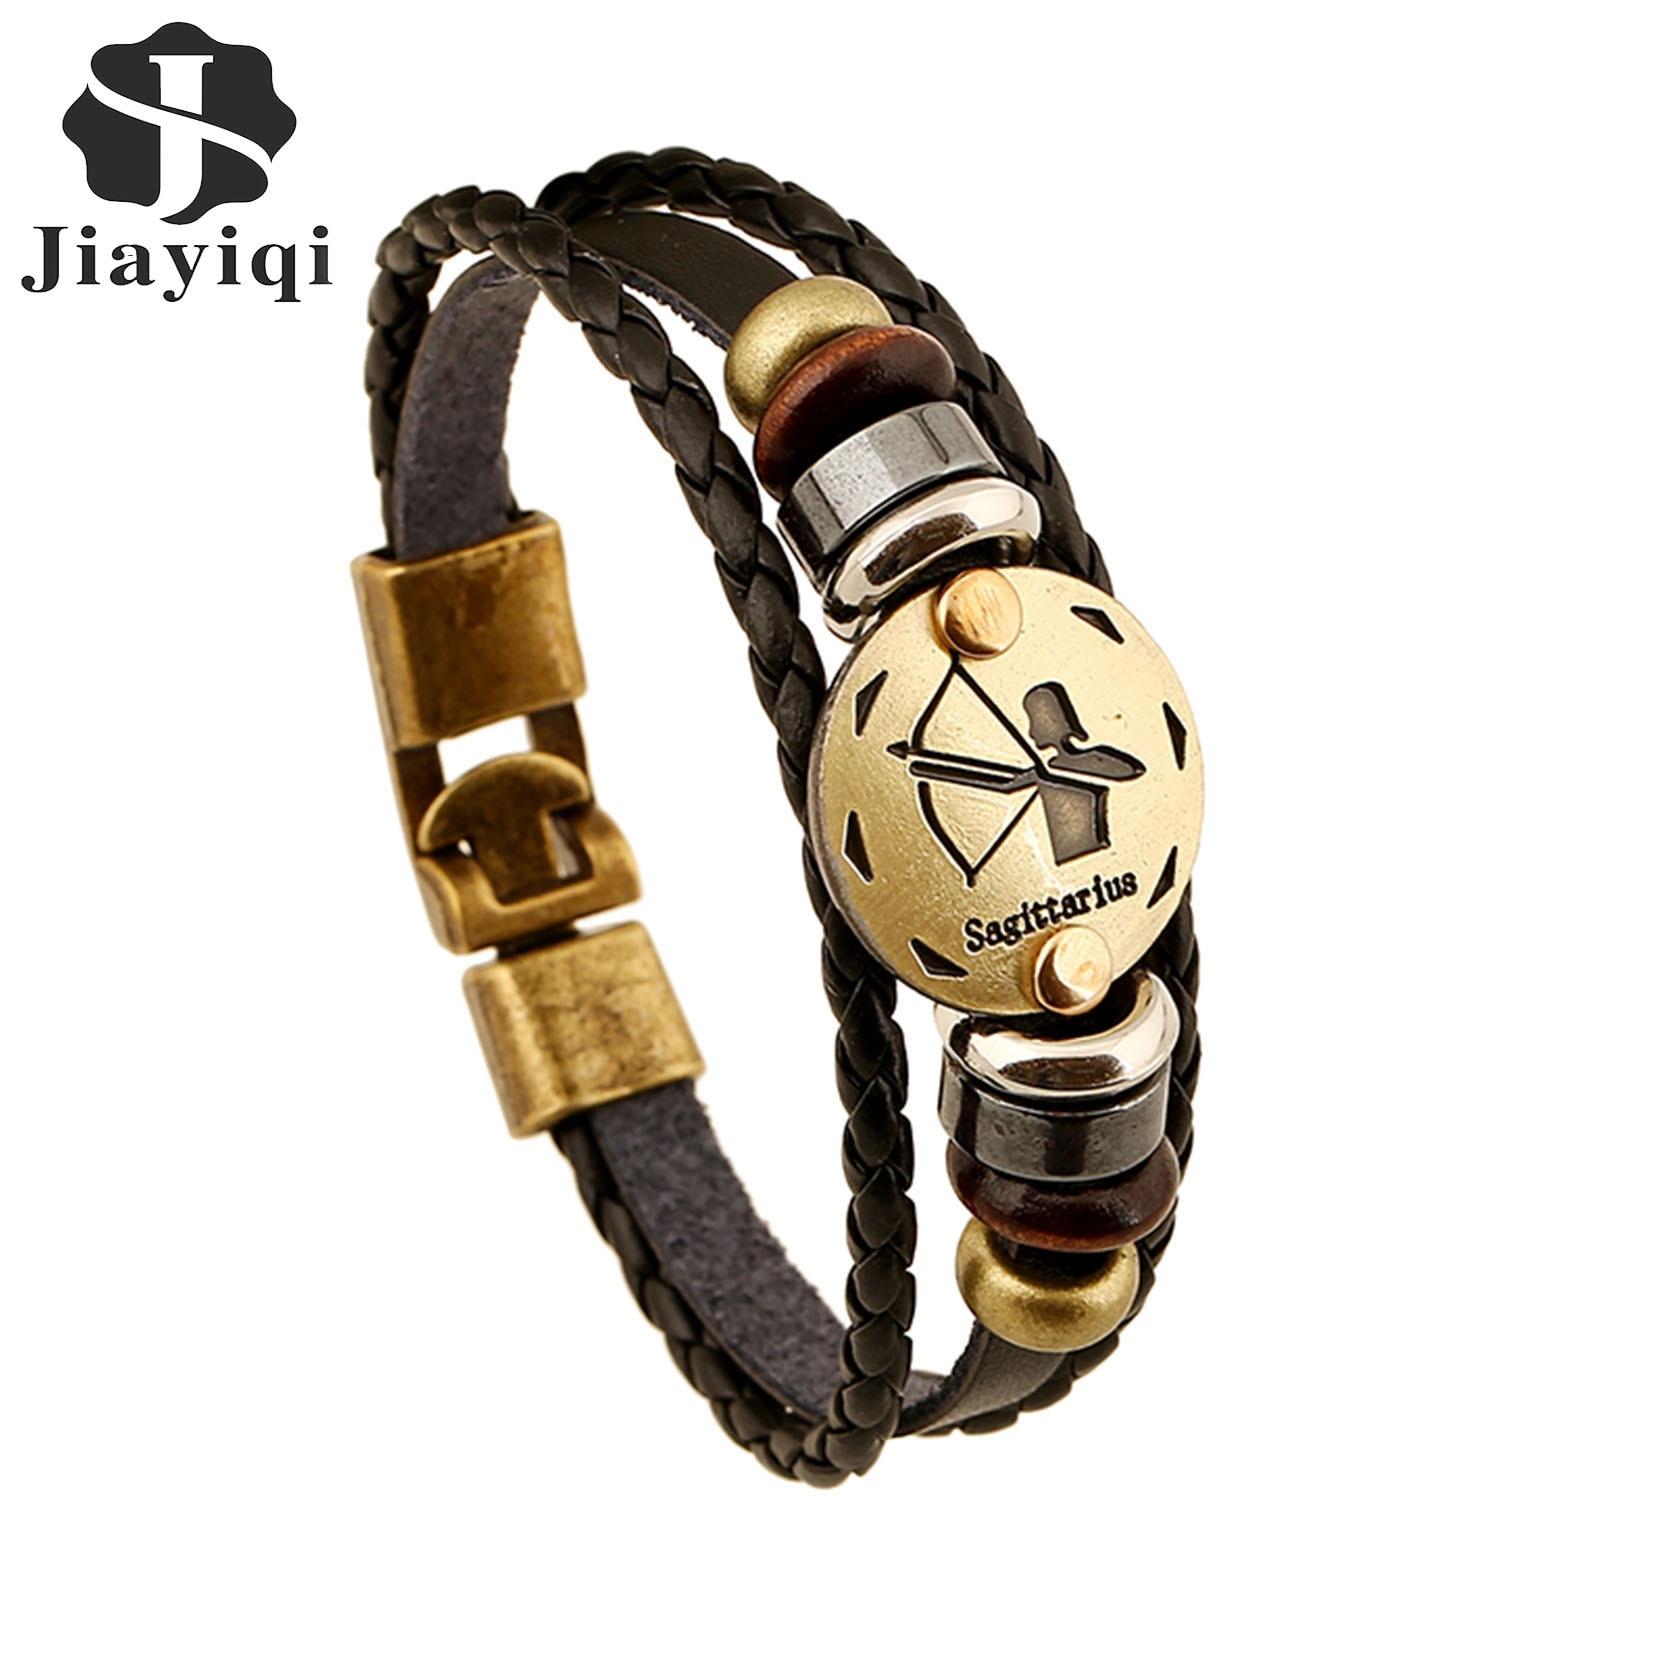 Jiayiqi Fashion Charm Jewelry Bronze Alloy 12 Zodiac Leathers